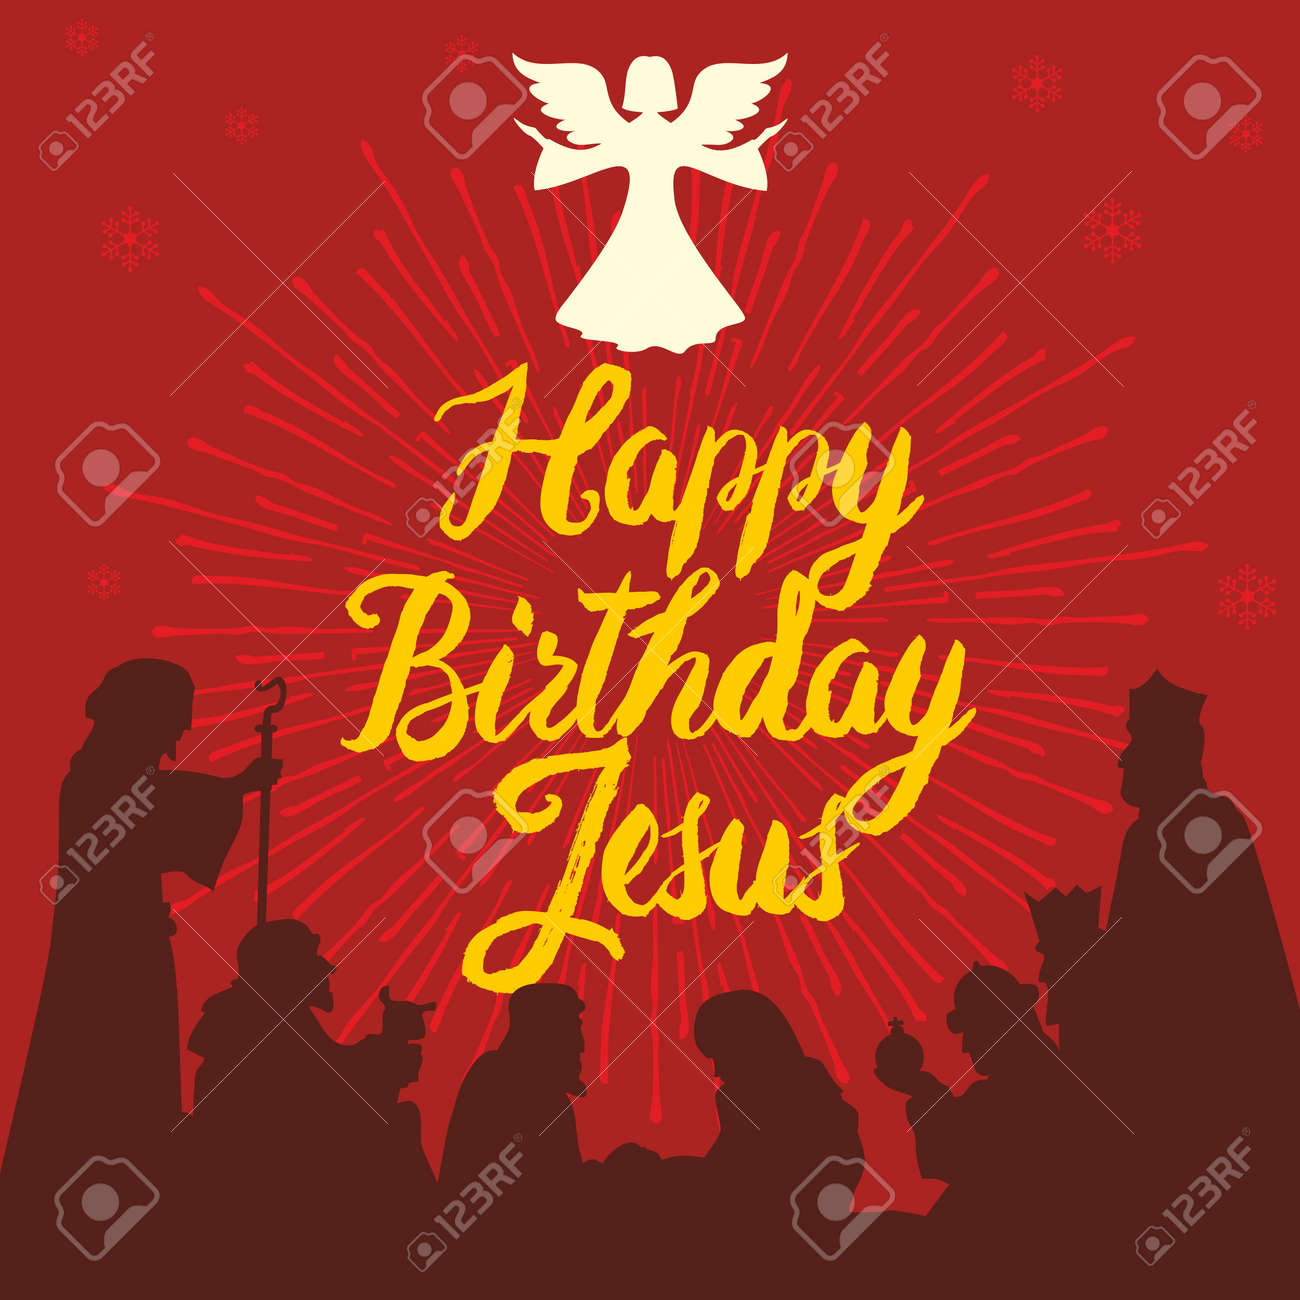 Happy Birthday Jesus. Merry Christmas Royalty Free Cliparts, Vectors ...